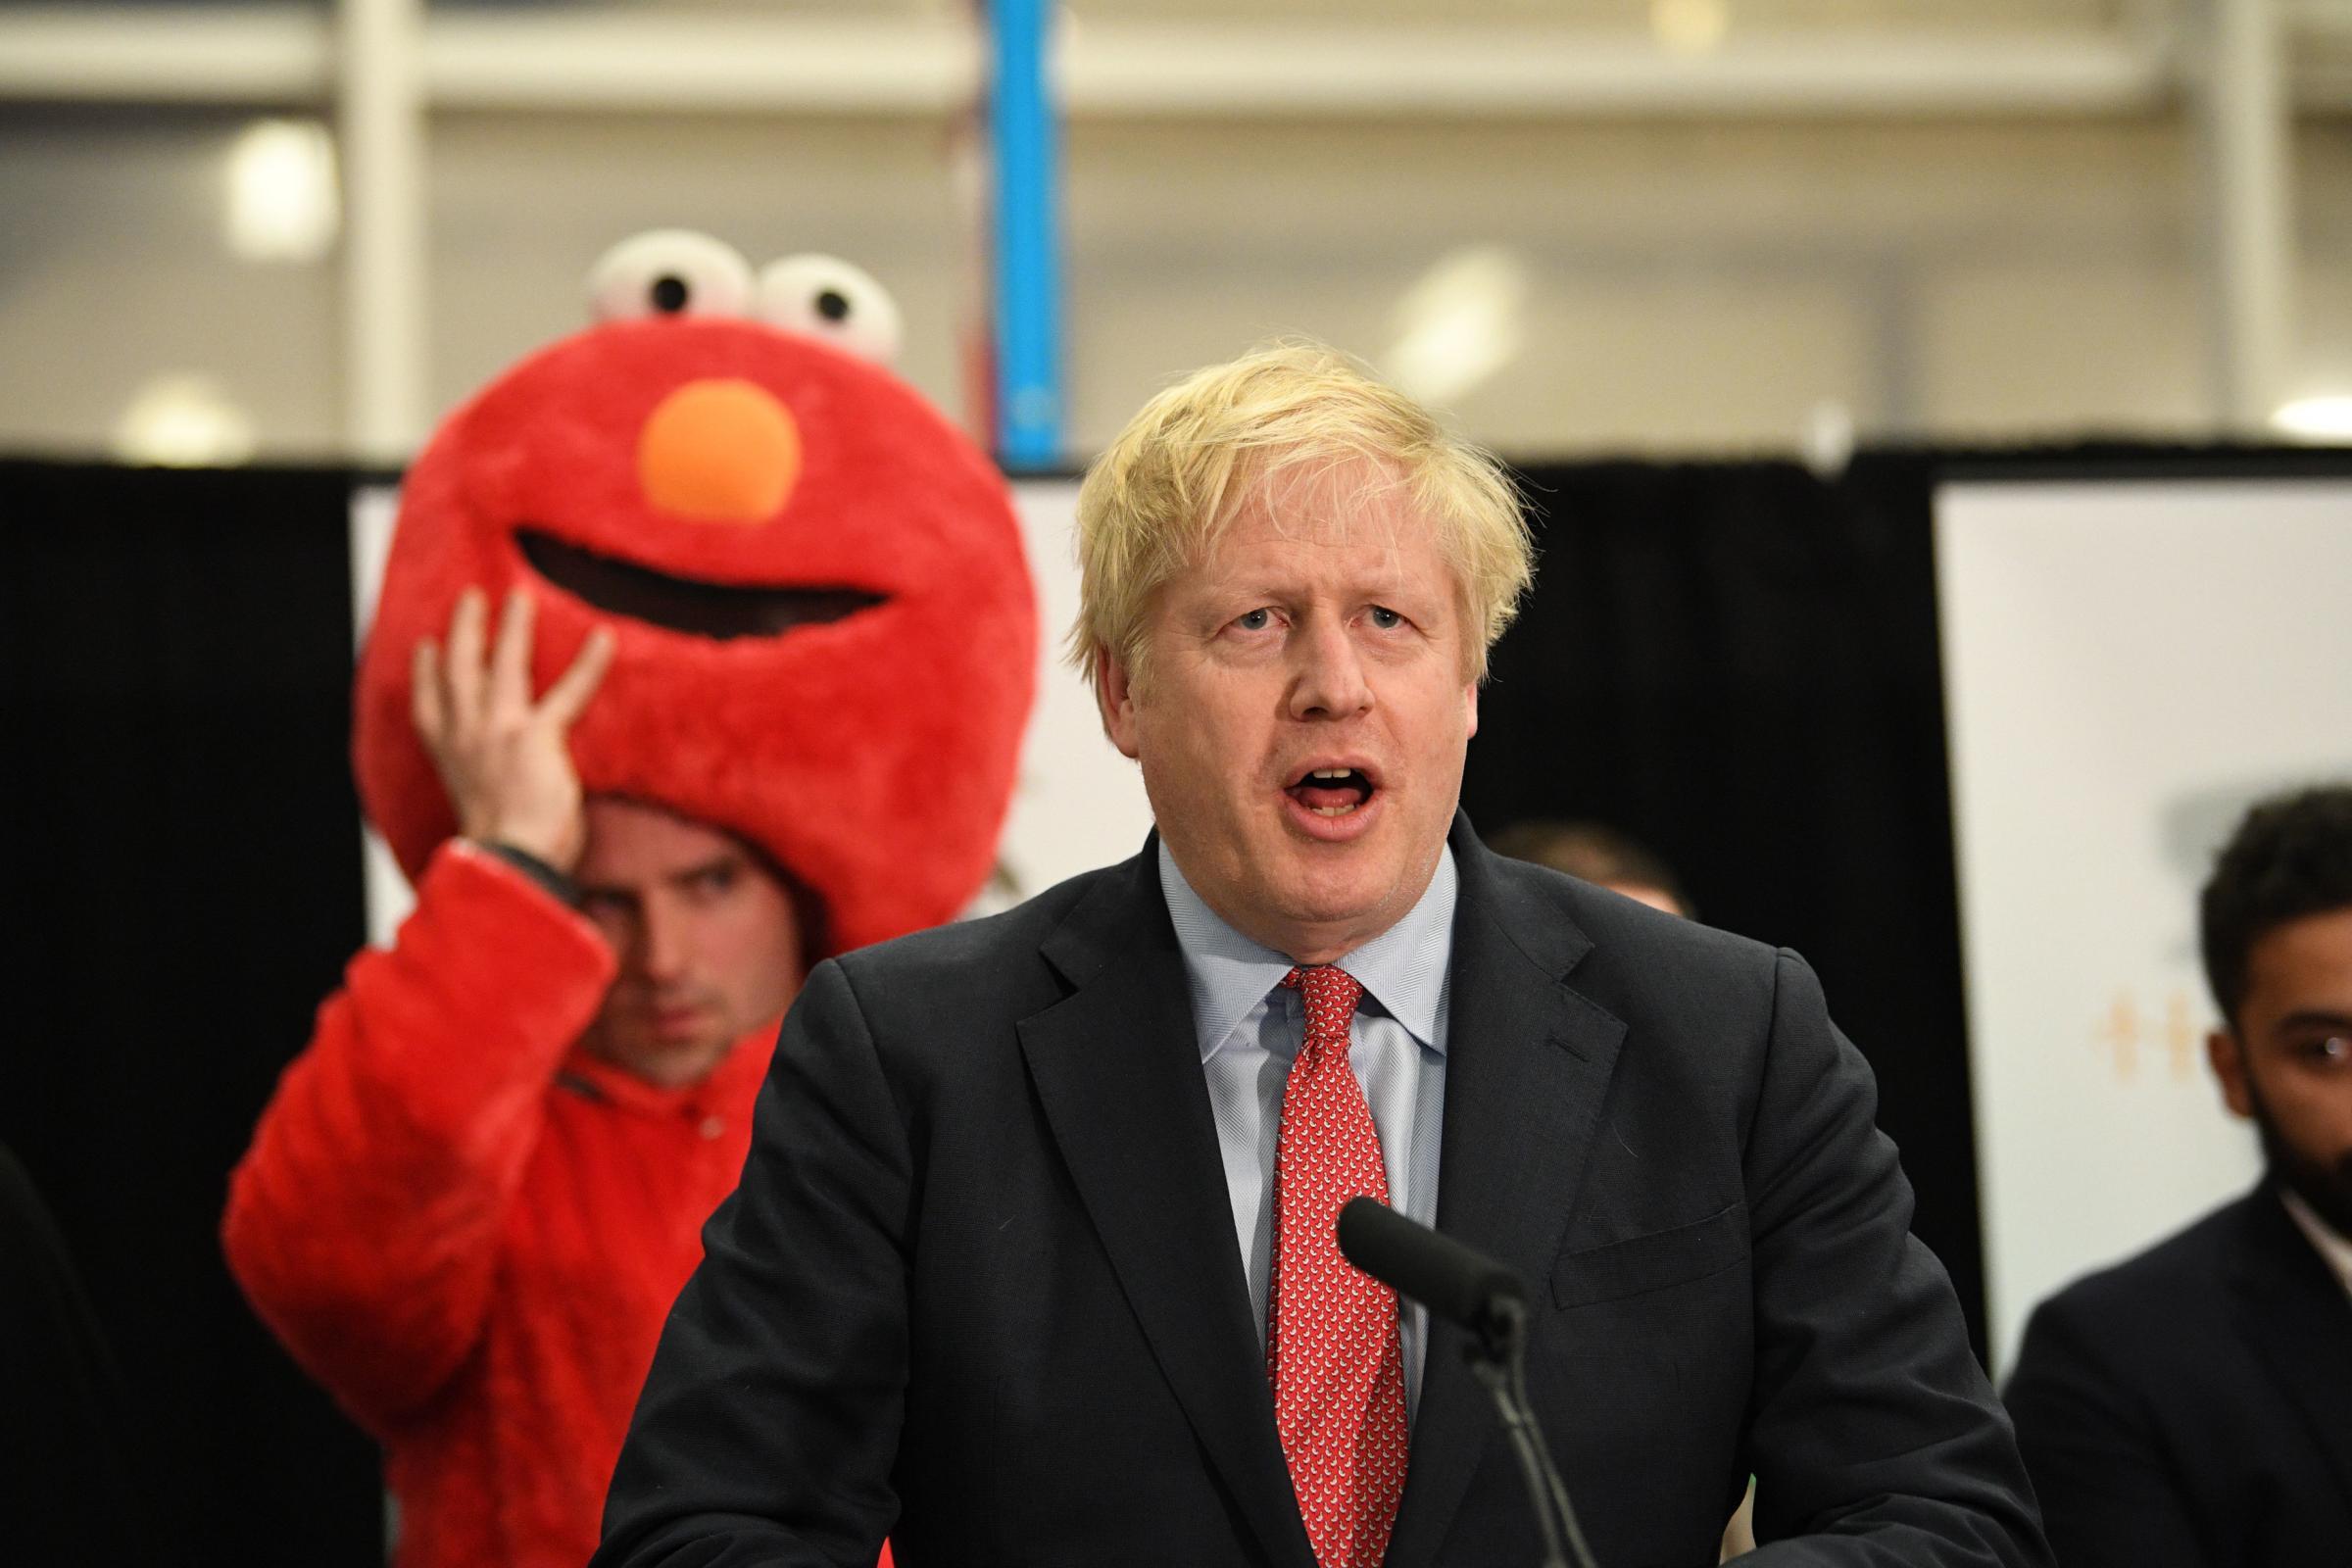 GENERAL ELECTION 2019: Boris Johnson hails Conservative majority